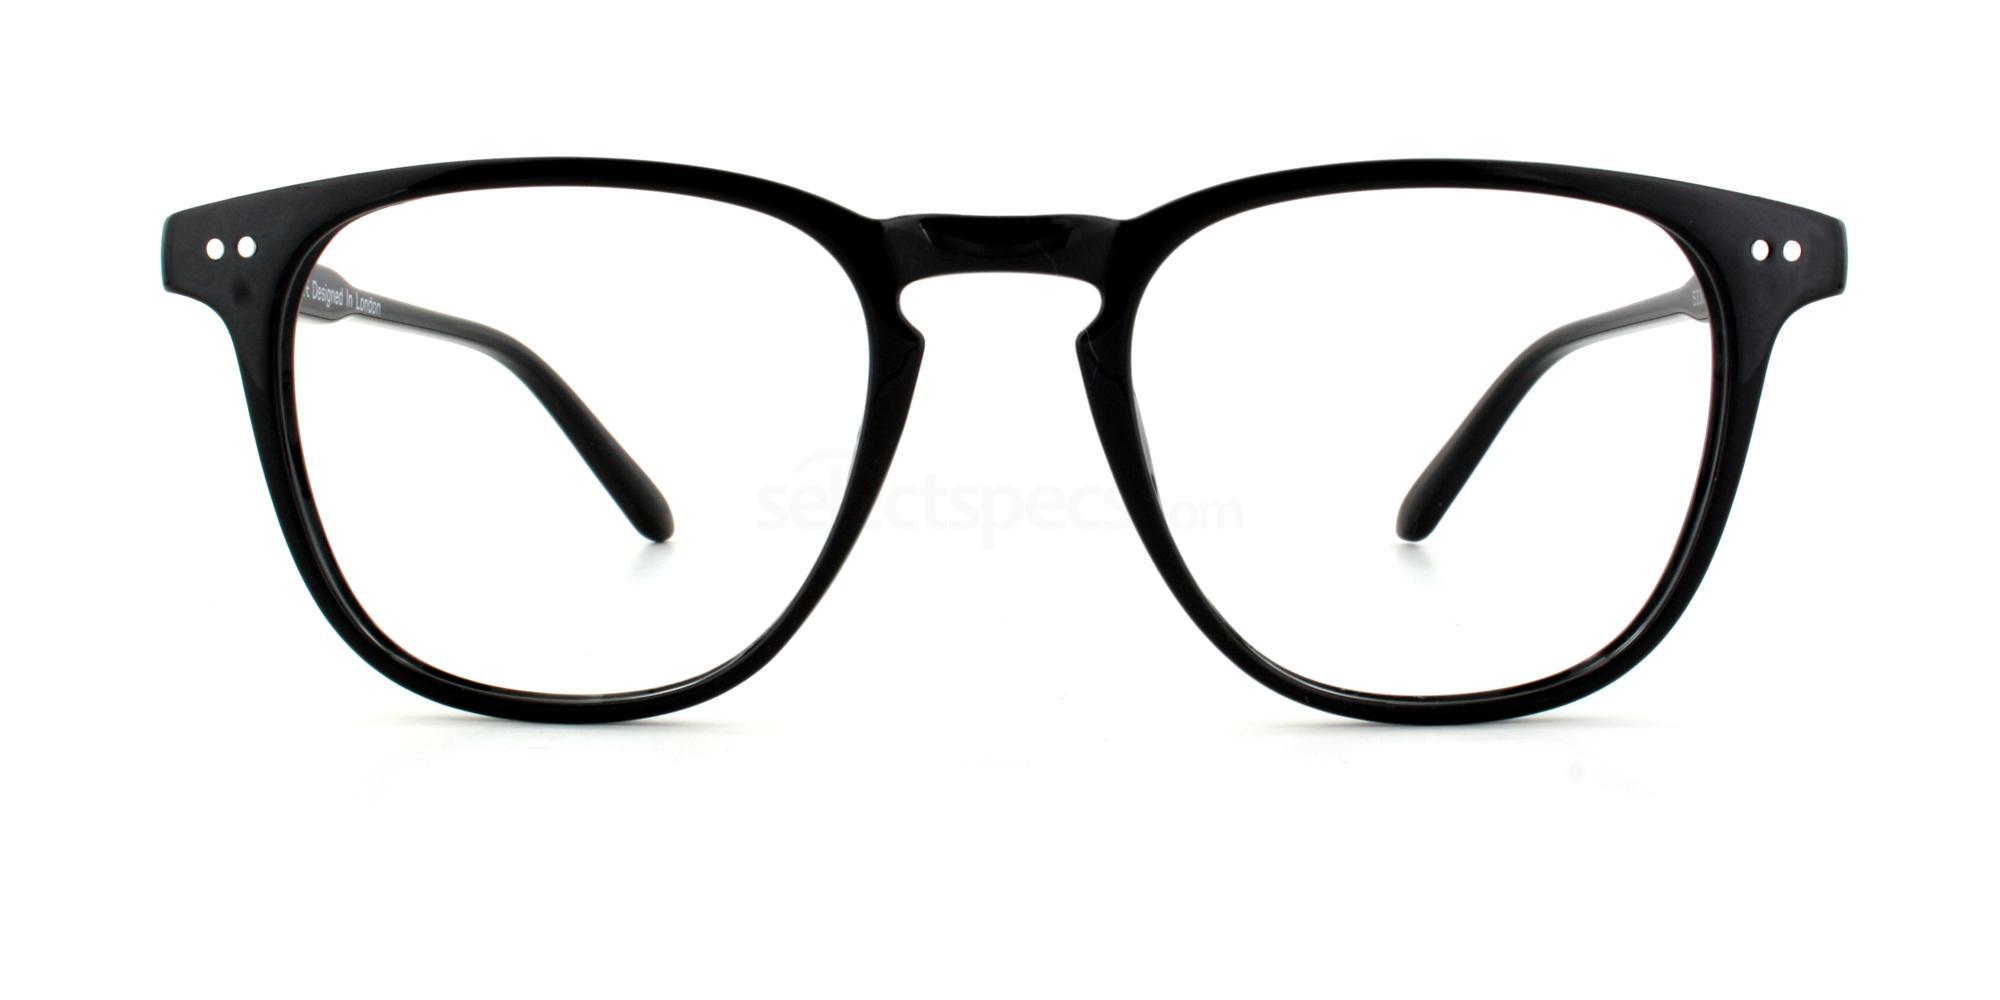 C1 SENATOR 339 Glasses, Senator